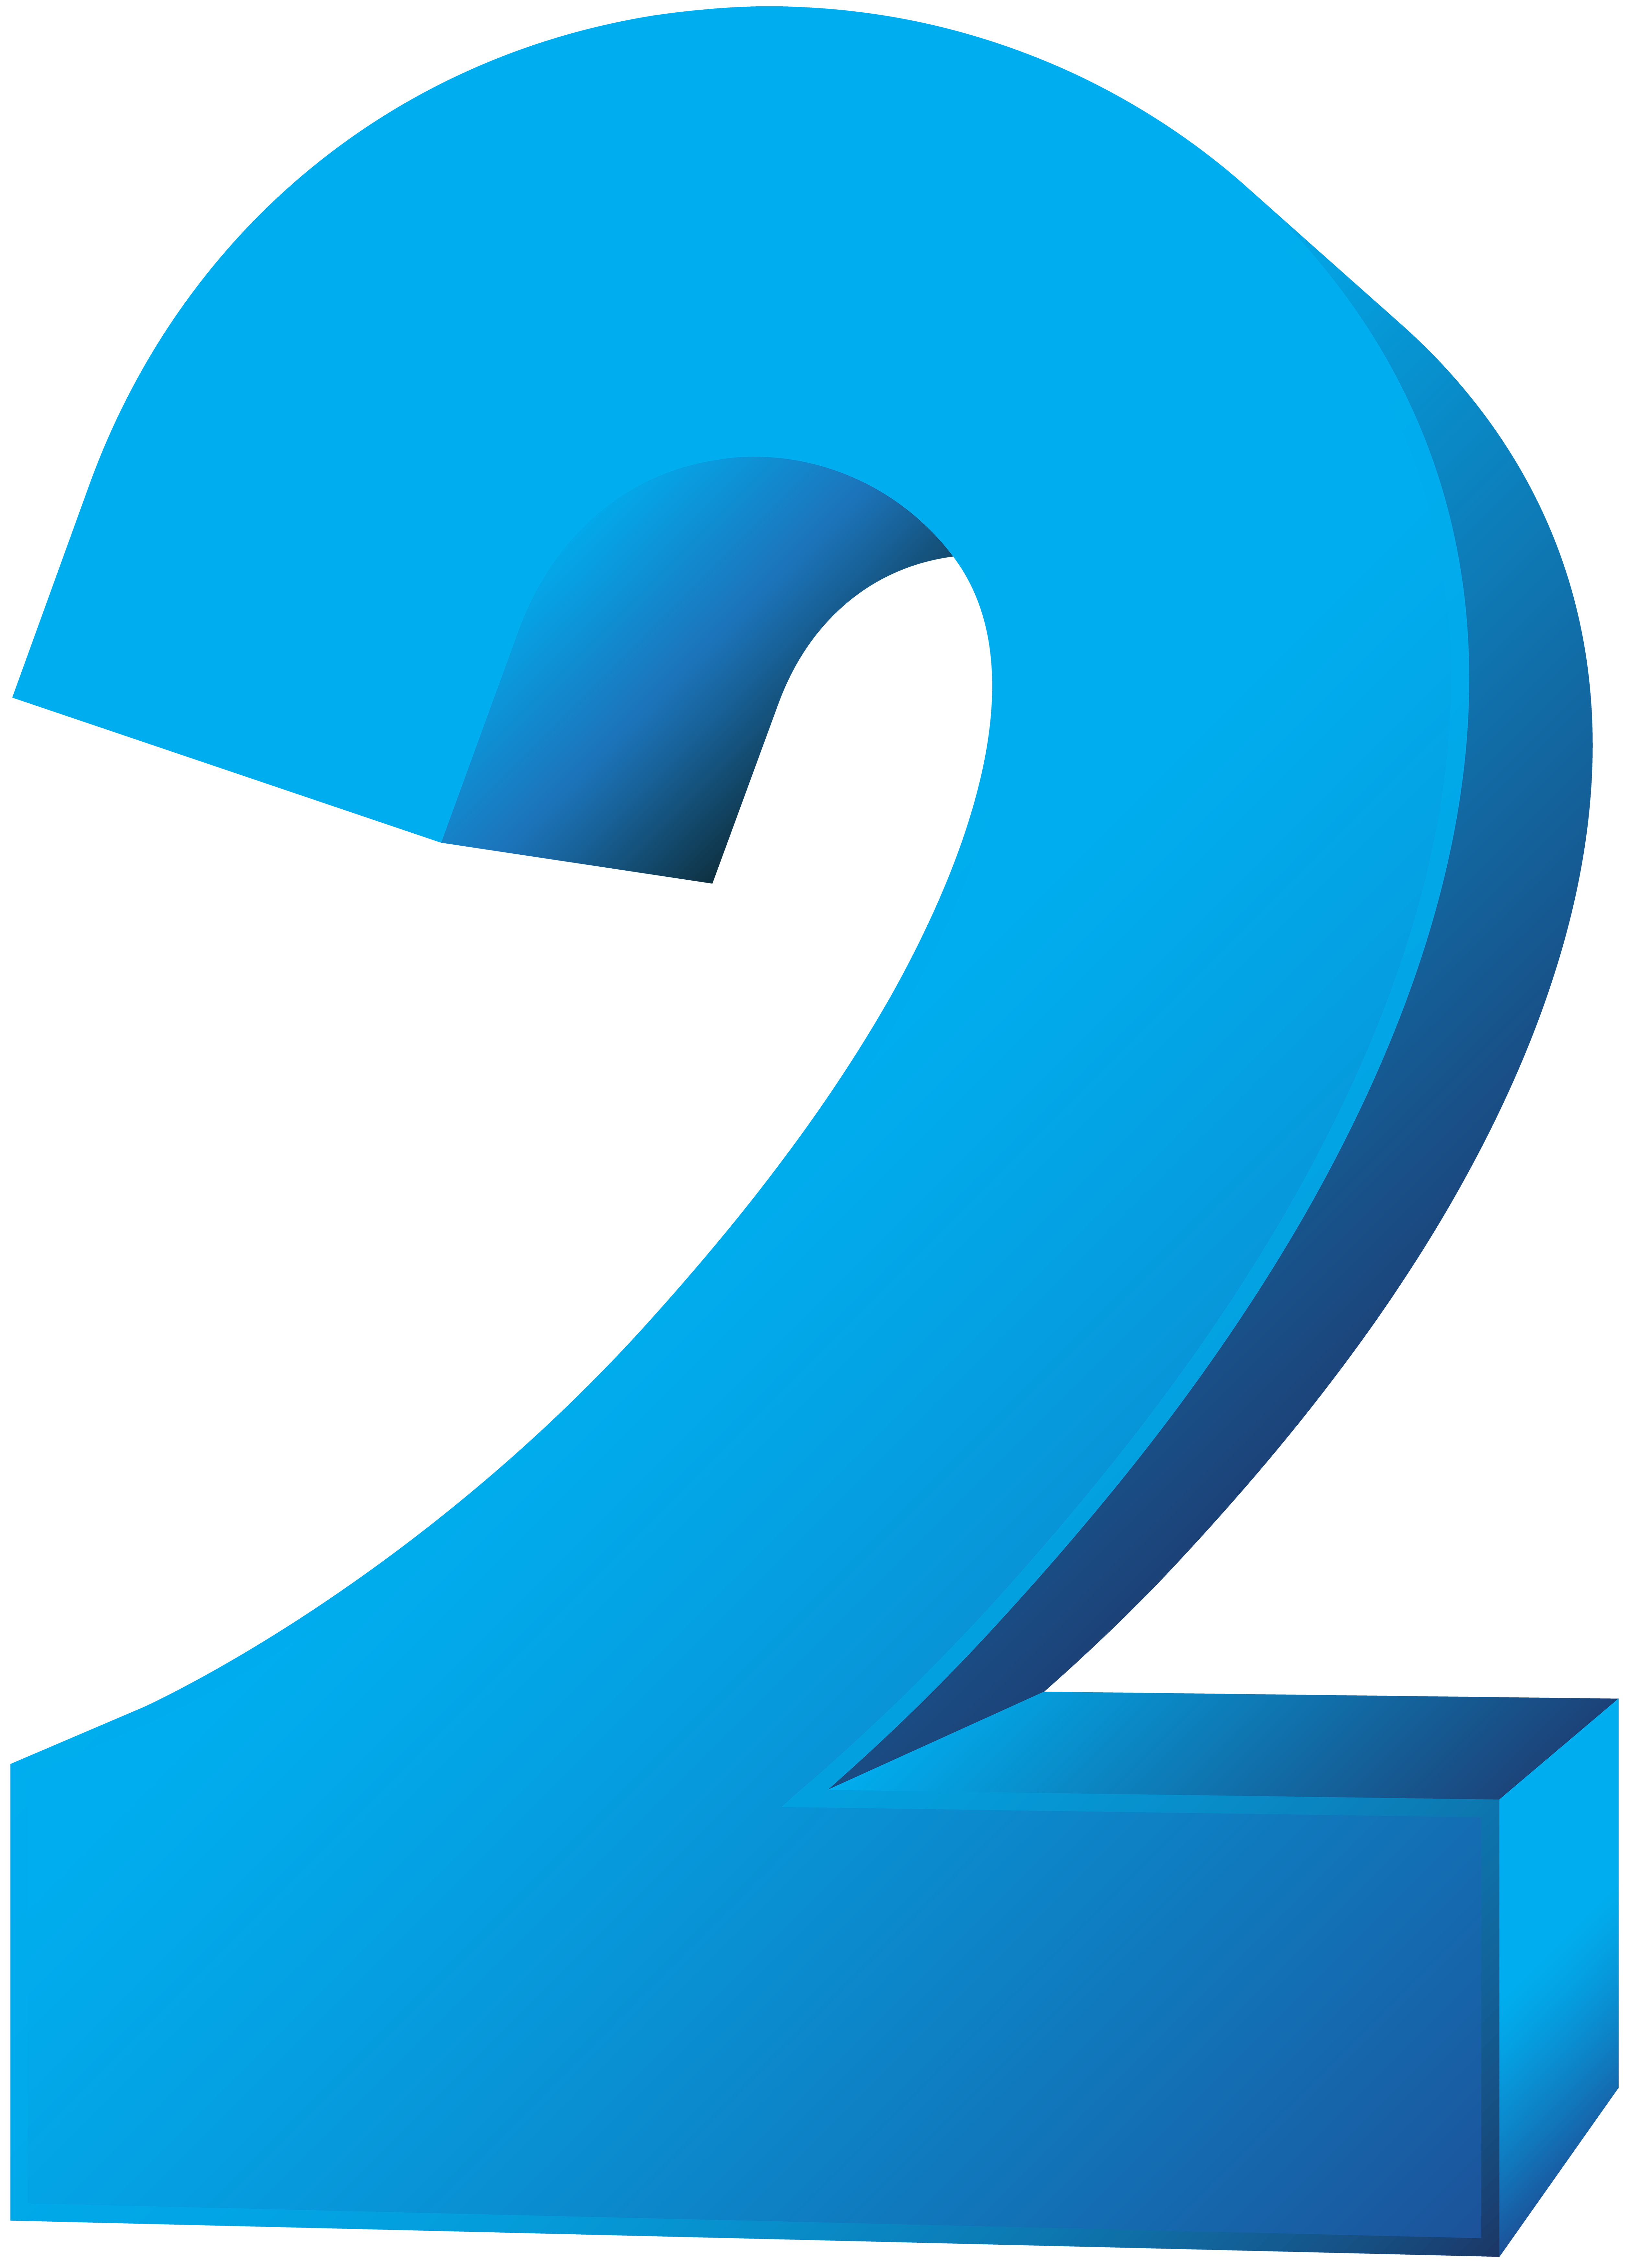 Blue Number Two Transparent PNG Clip Art Image.